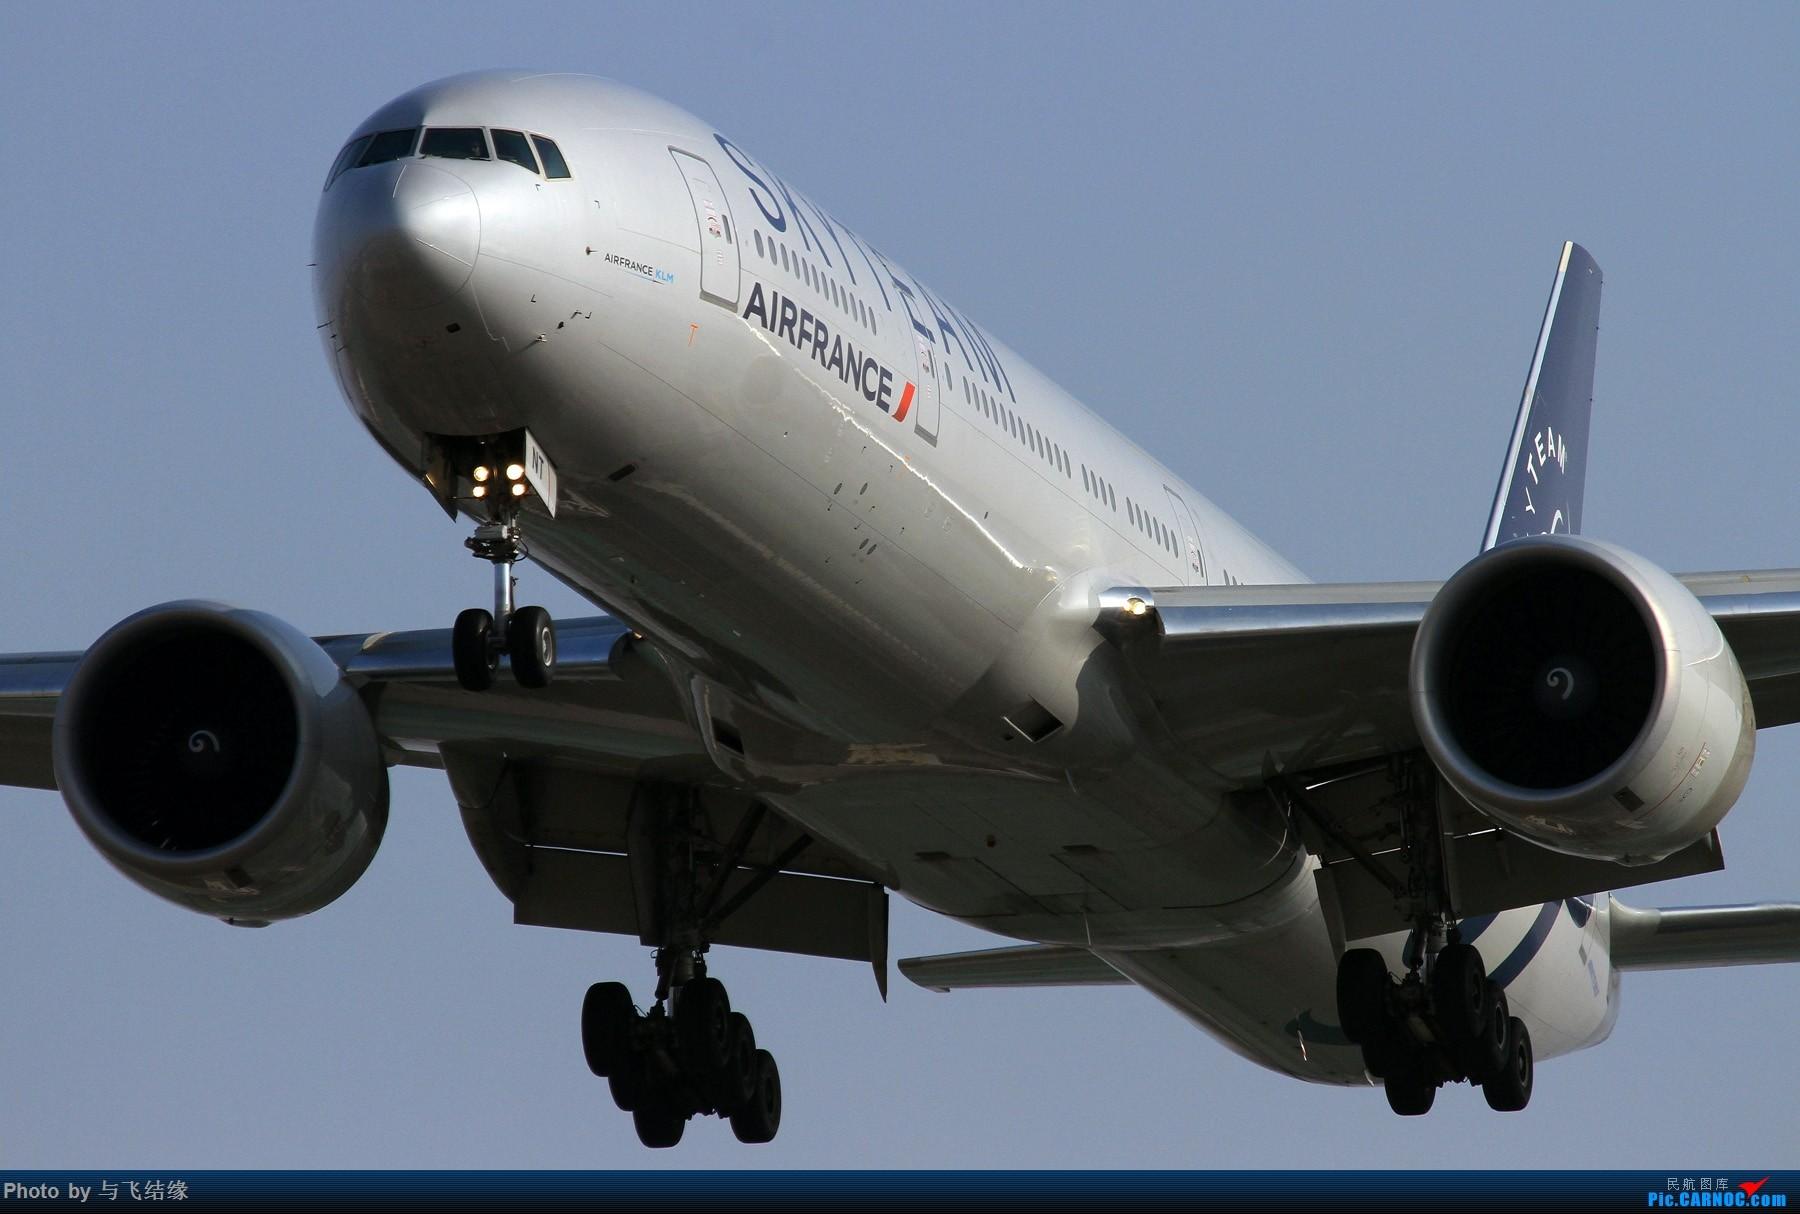 Re:[原创]法国航空公司天合联盟涂装Boeing 777-300ER。 BOEING 777-300ER F-QZNT 中国北京首都国际机场